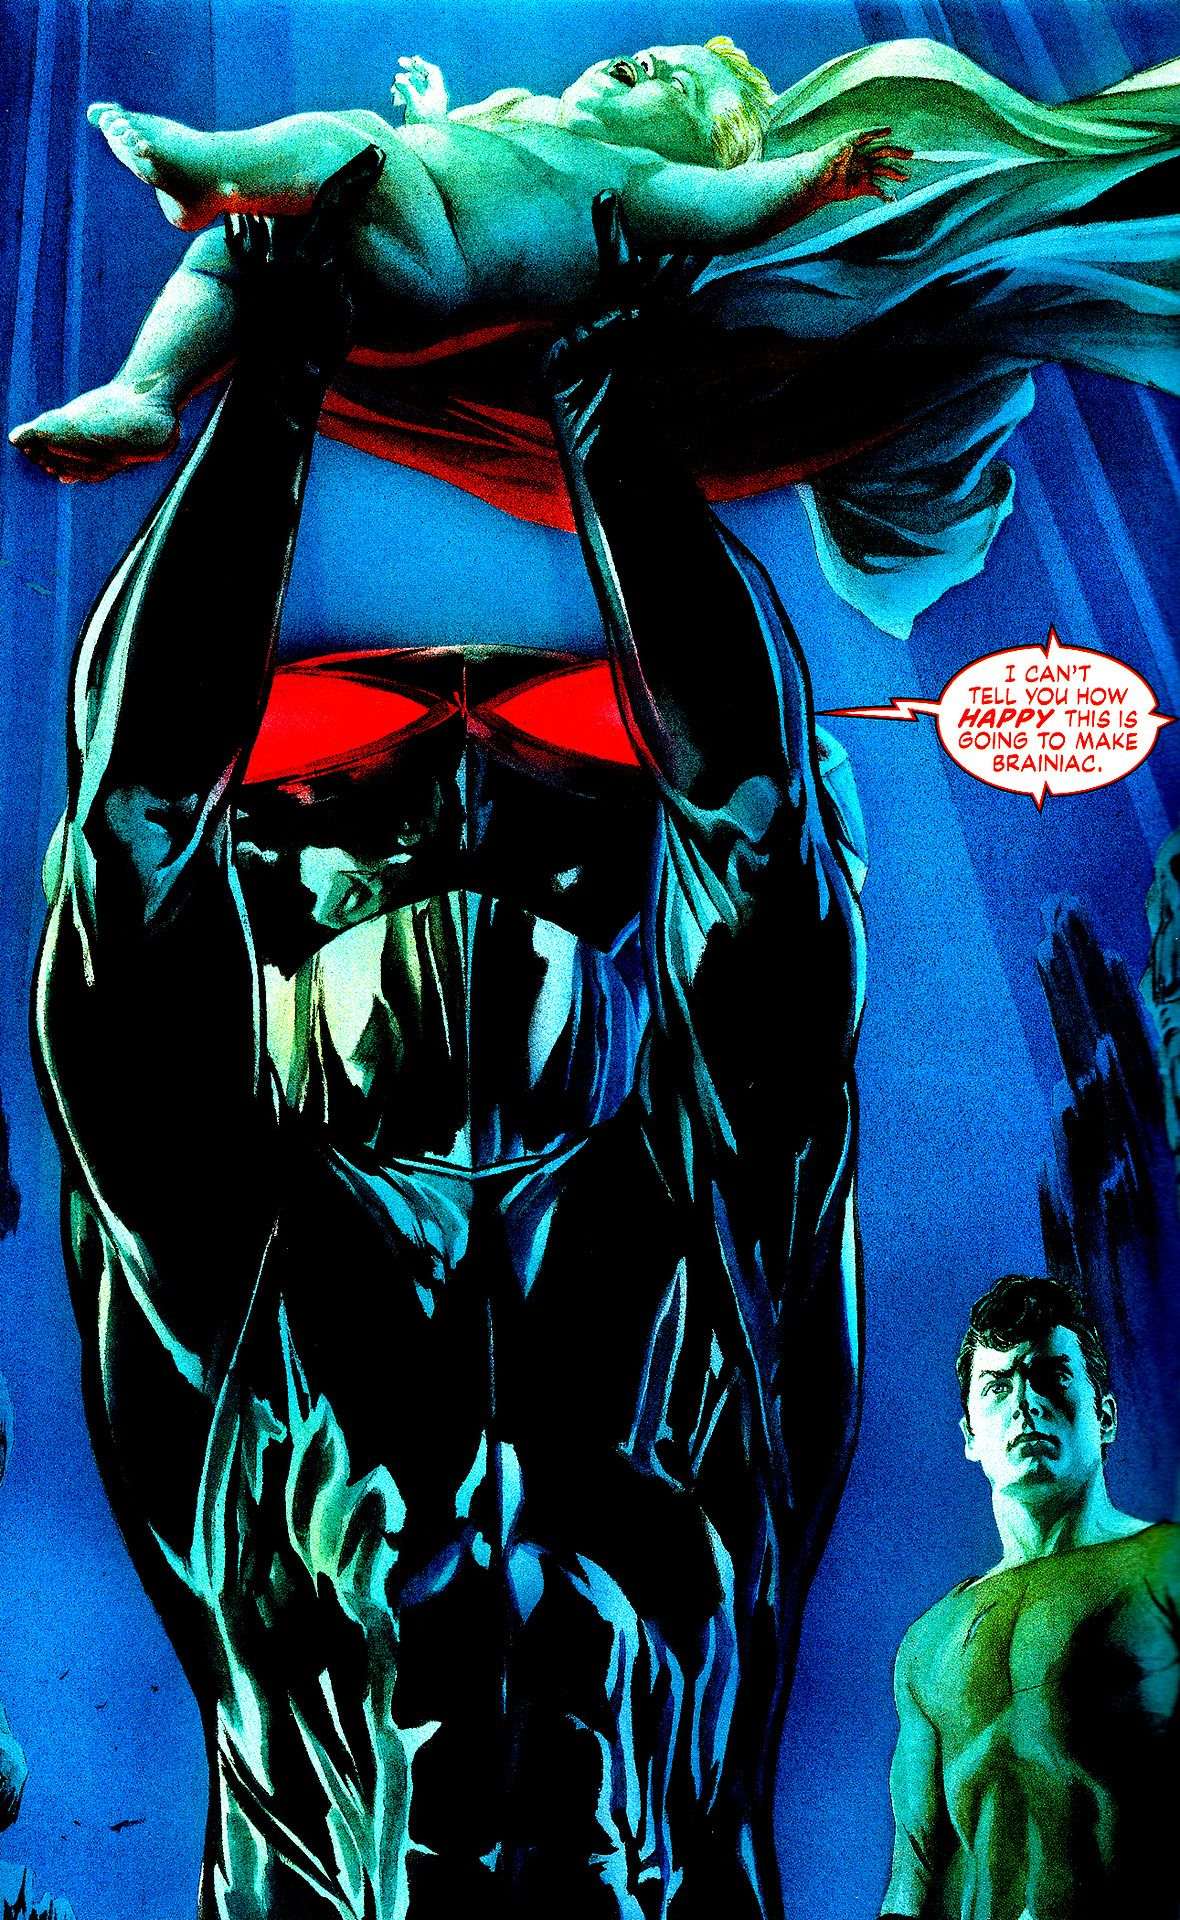 Black Manta/Justice#7 by Alex Ross | Art of Alex Ross ...